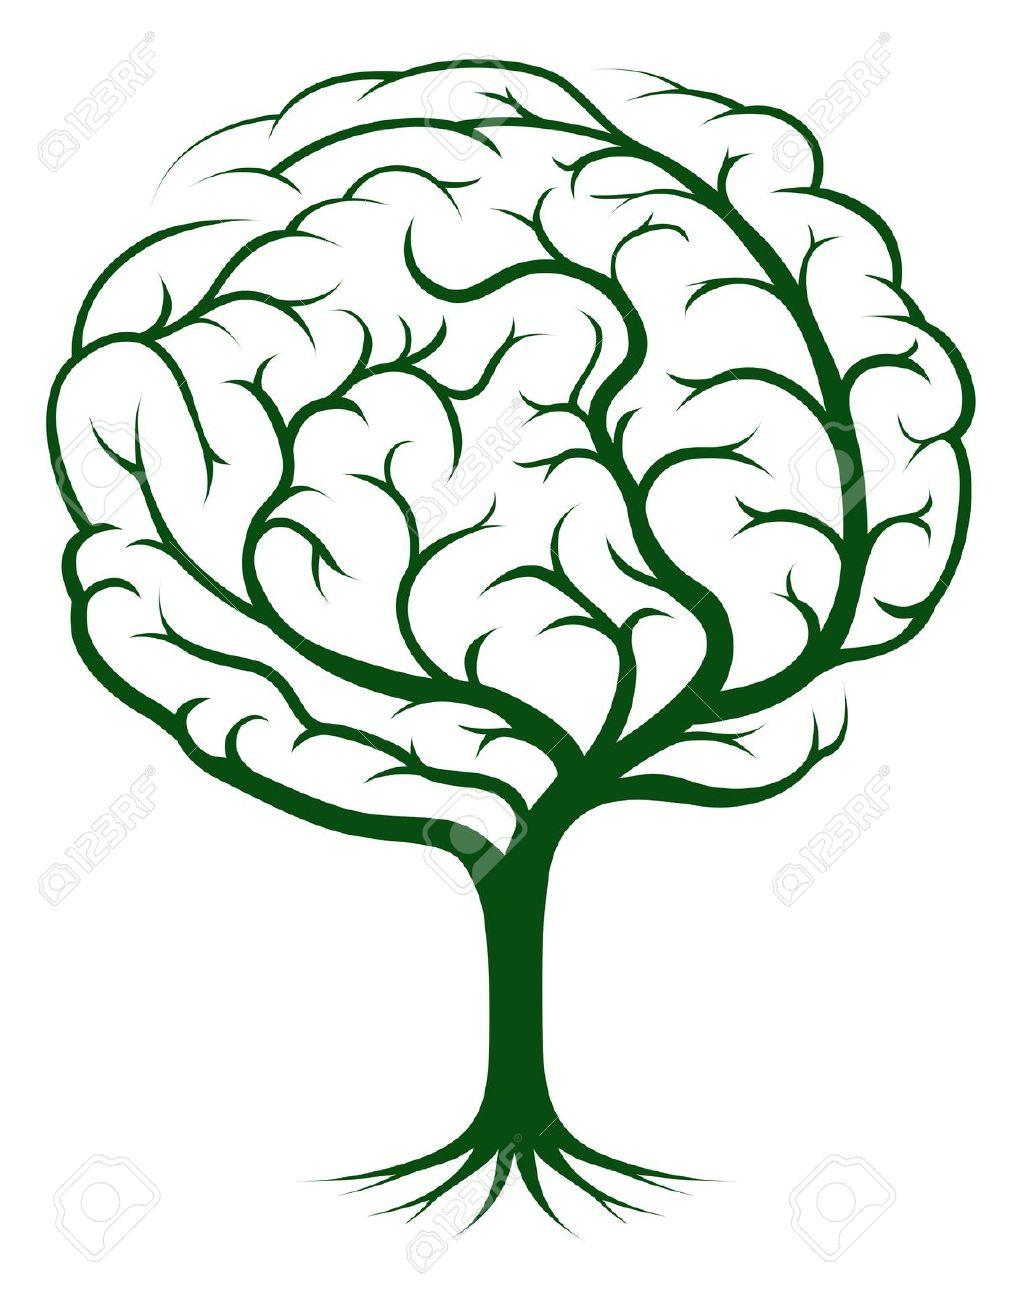 Brain Tree Illustration, Tree Of Knowledge, Medical, Environmental.